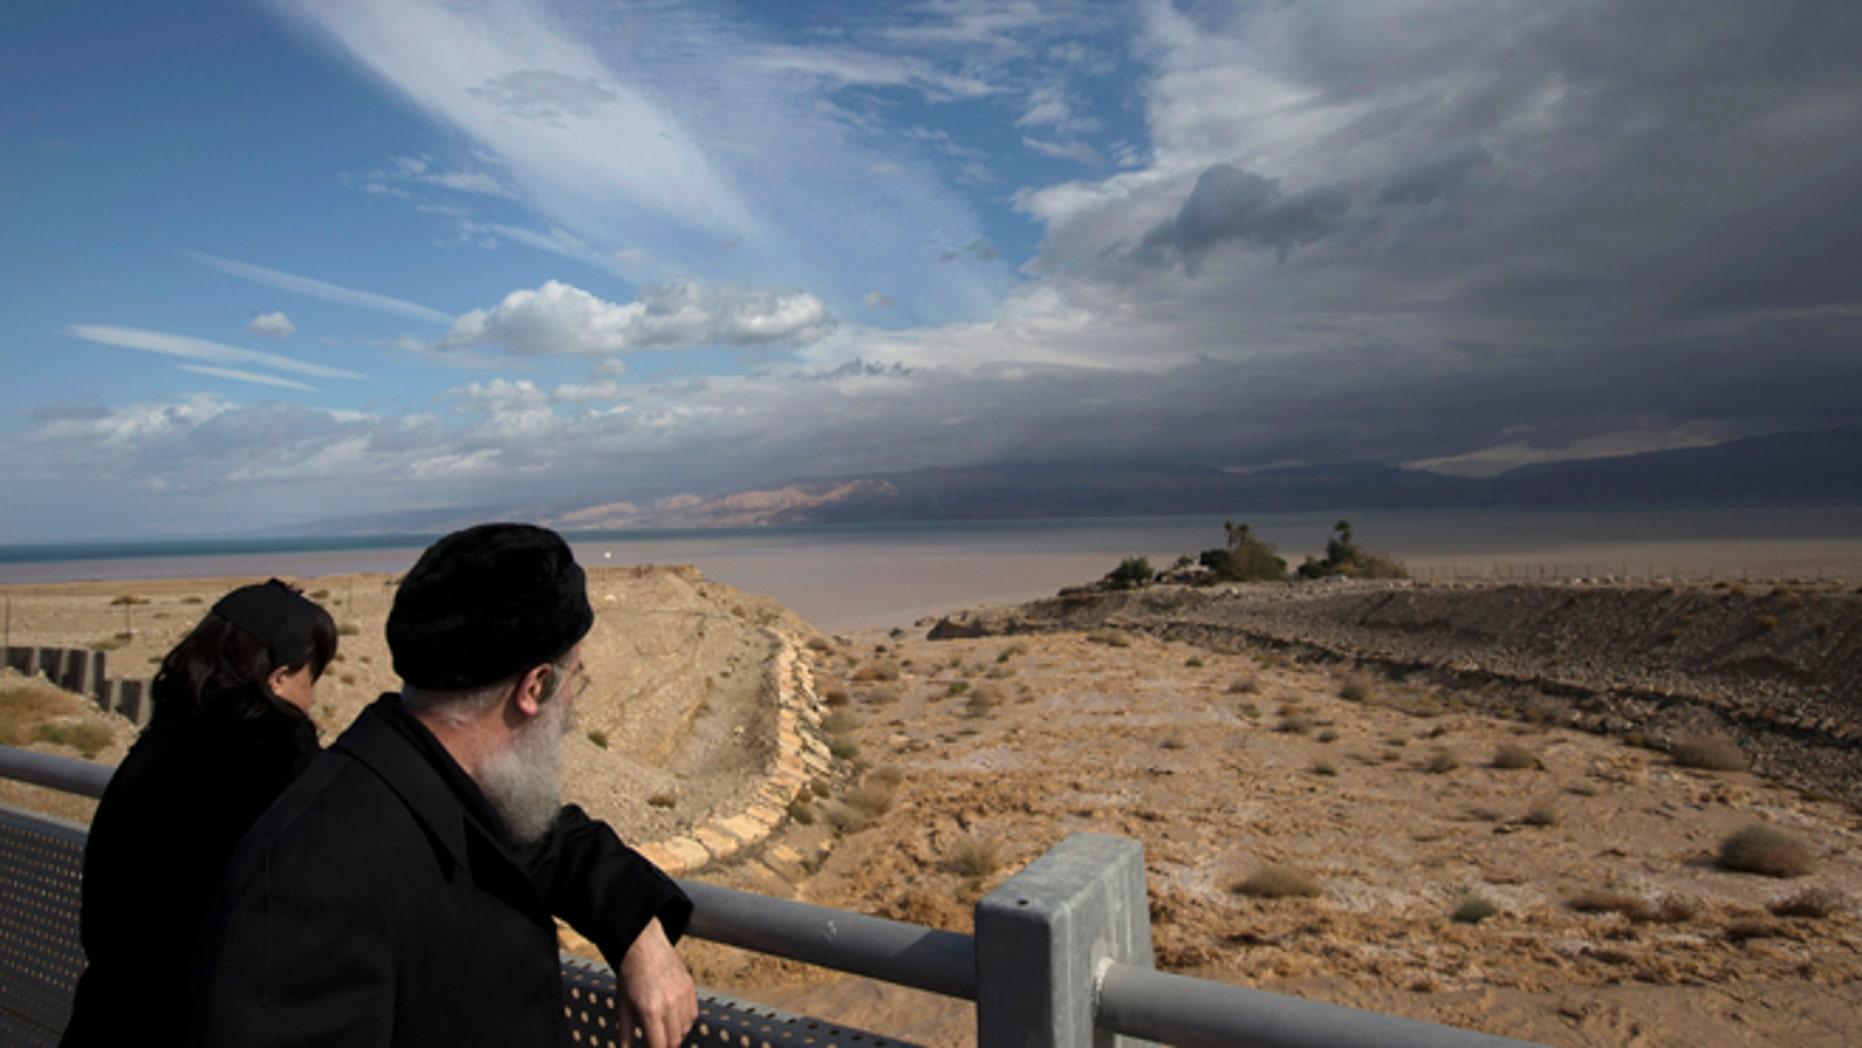 Jan. 9, 2013: A couple looks at water flowing into the Dead Sea during a flash flood near Kibbutz Ein Gedi.